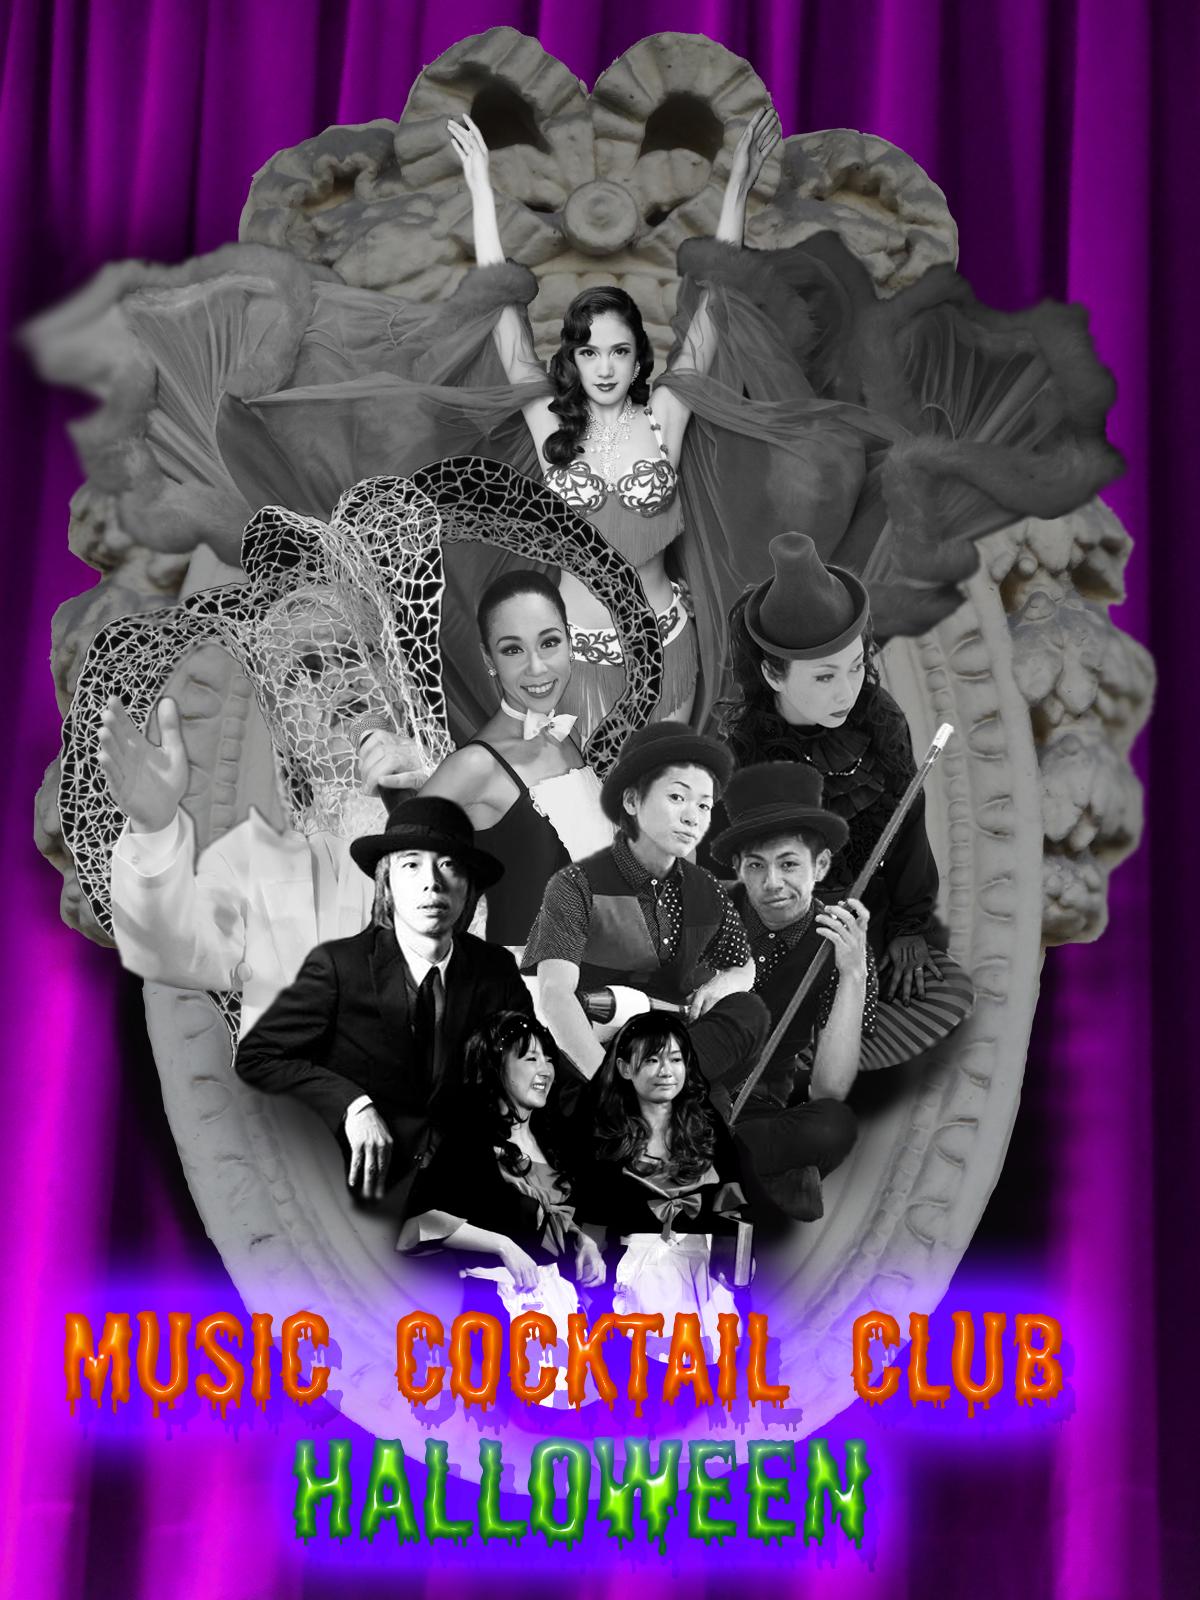 MUSIC COCKTAIL CLUB レシピ・ハロウィン